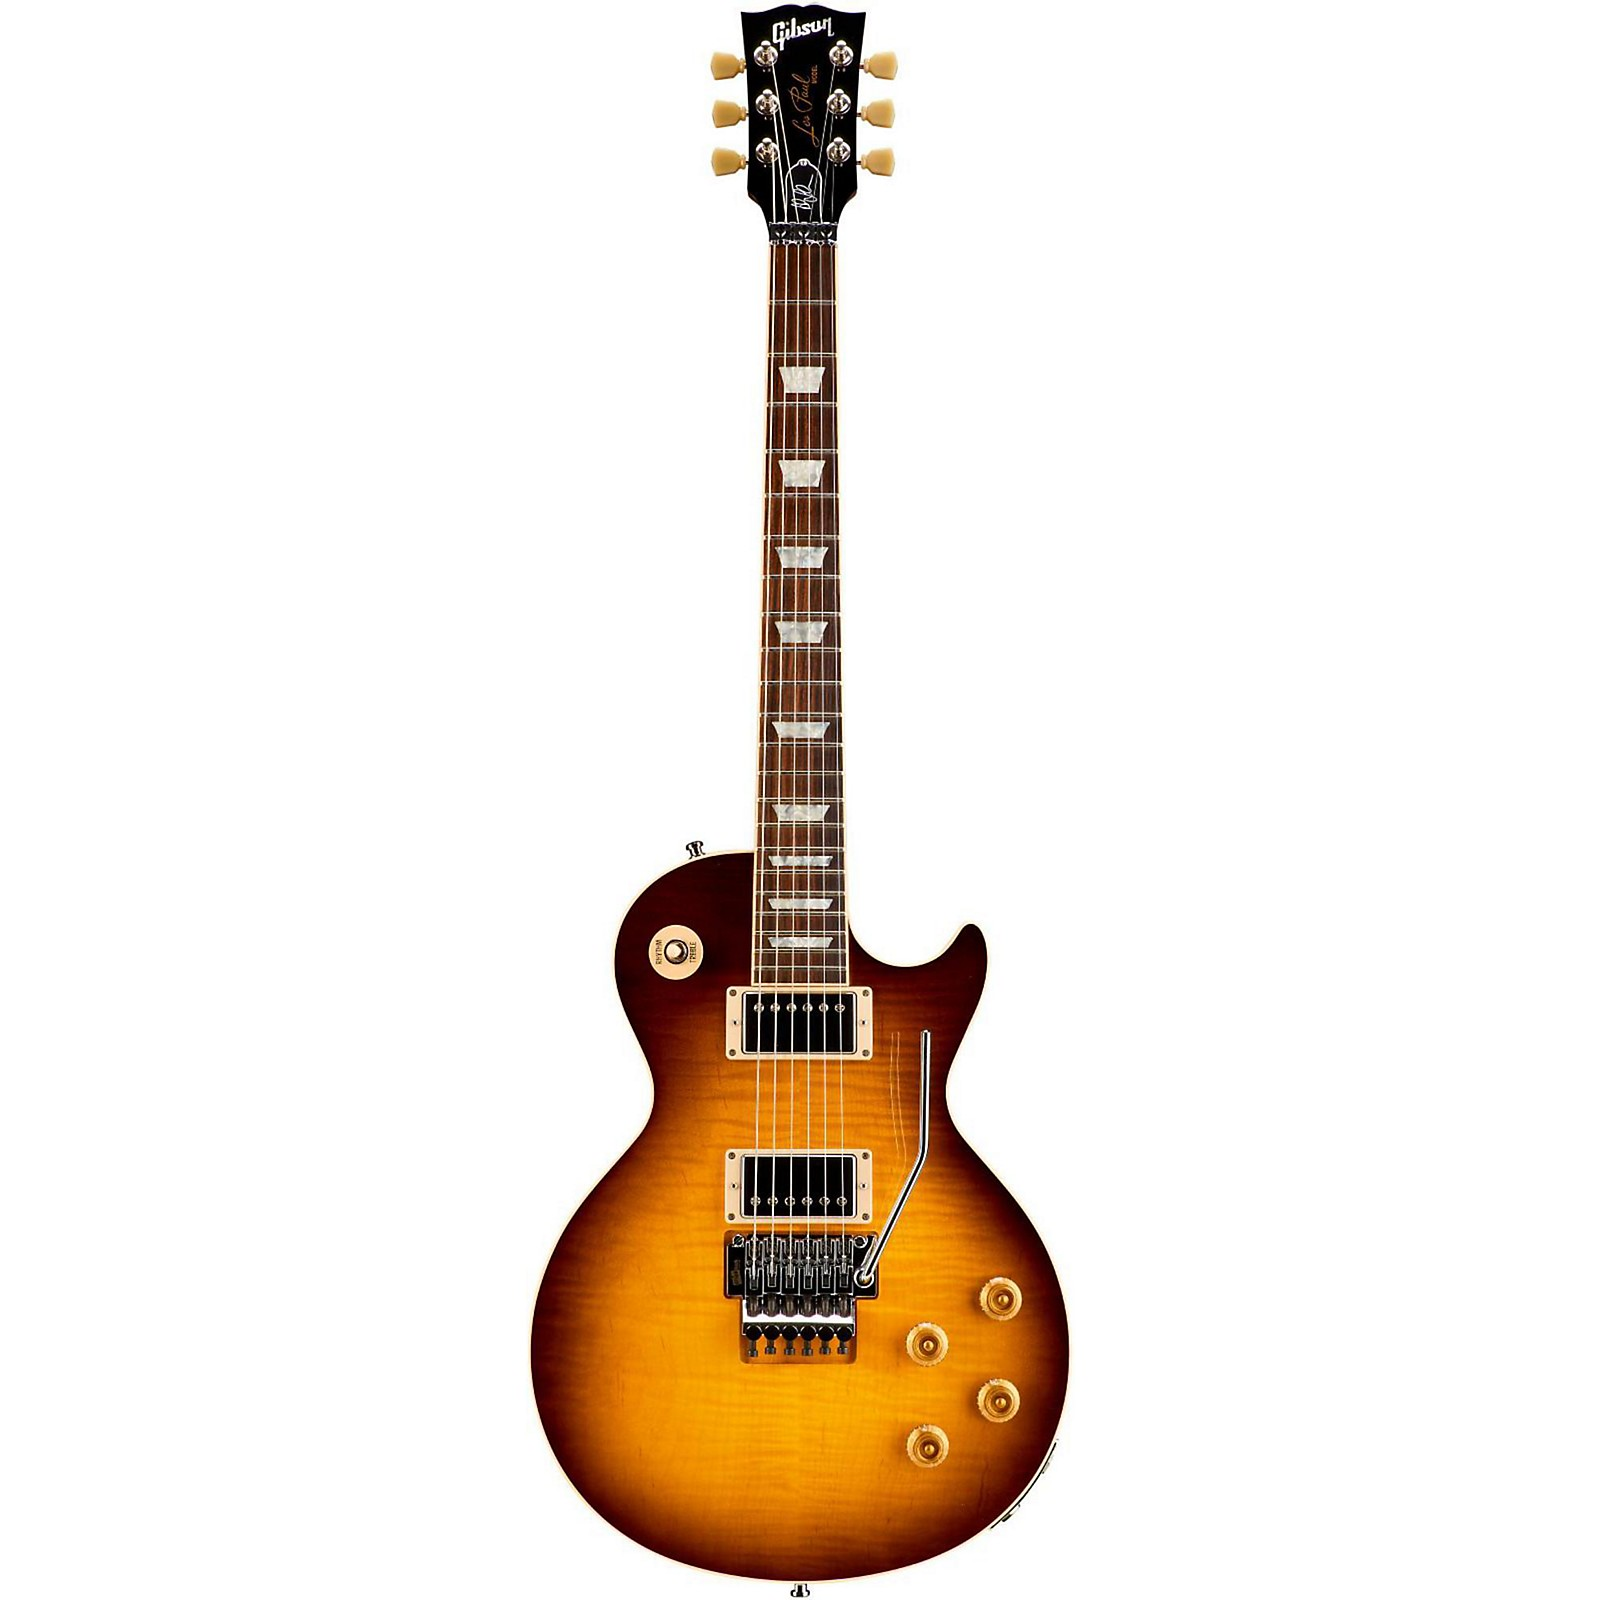 [ZHKZ_3066]  Gibson Custom Alex Lifeson Les Paul Axcess Electric Guitar | Musician's  Friend | Wiring Diagram Gibson Alex Lifeson |  | Musician's Friend